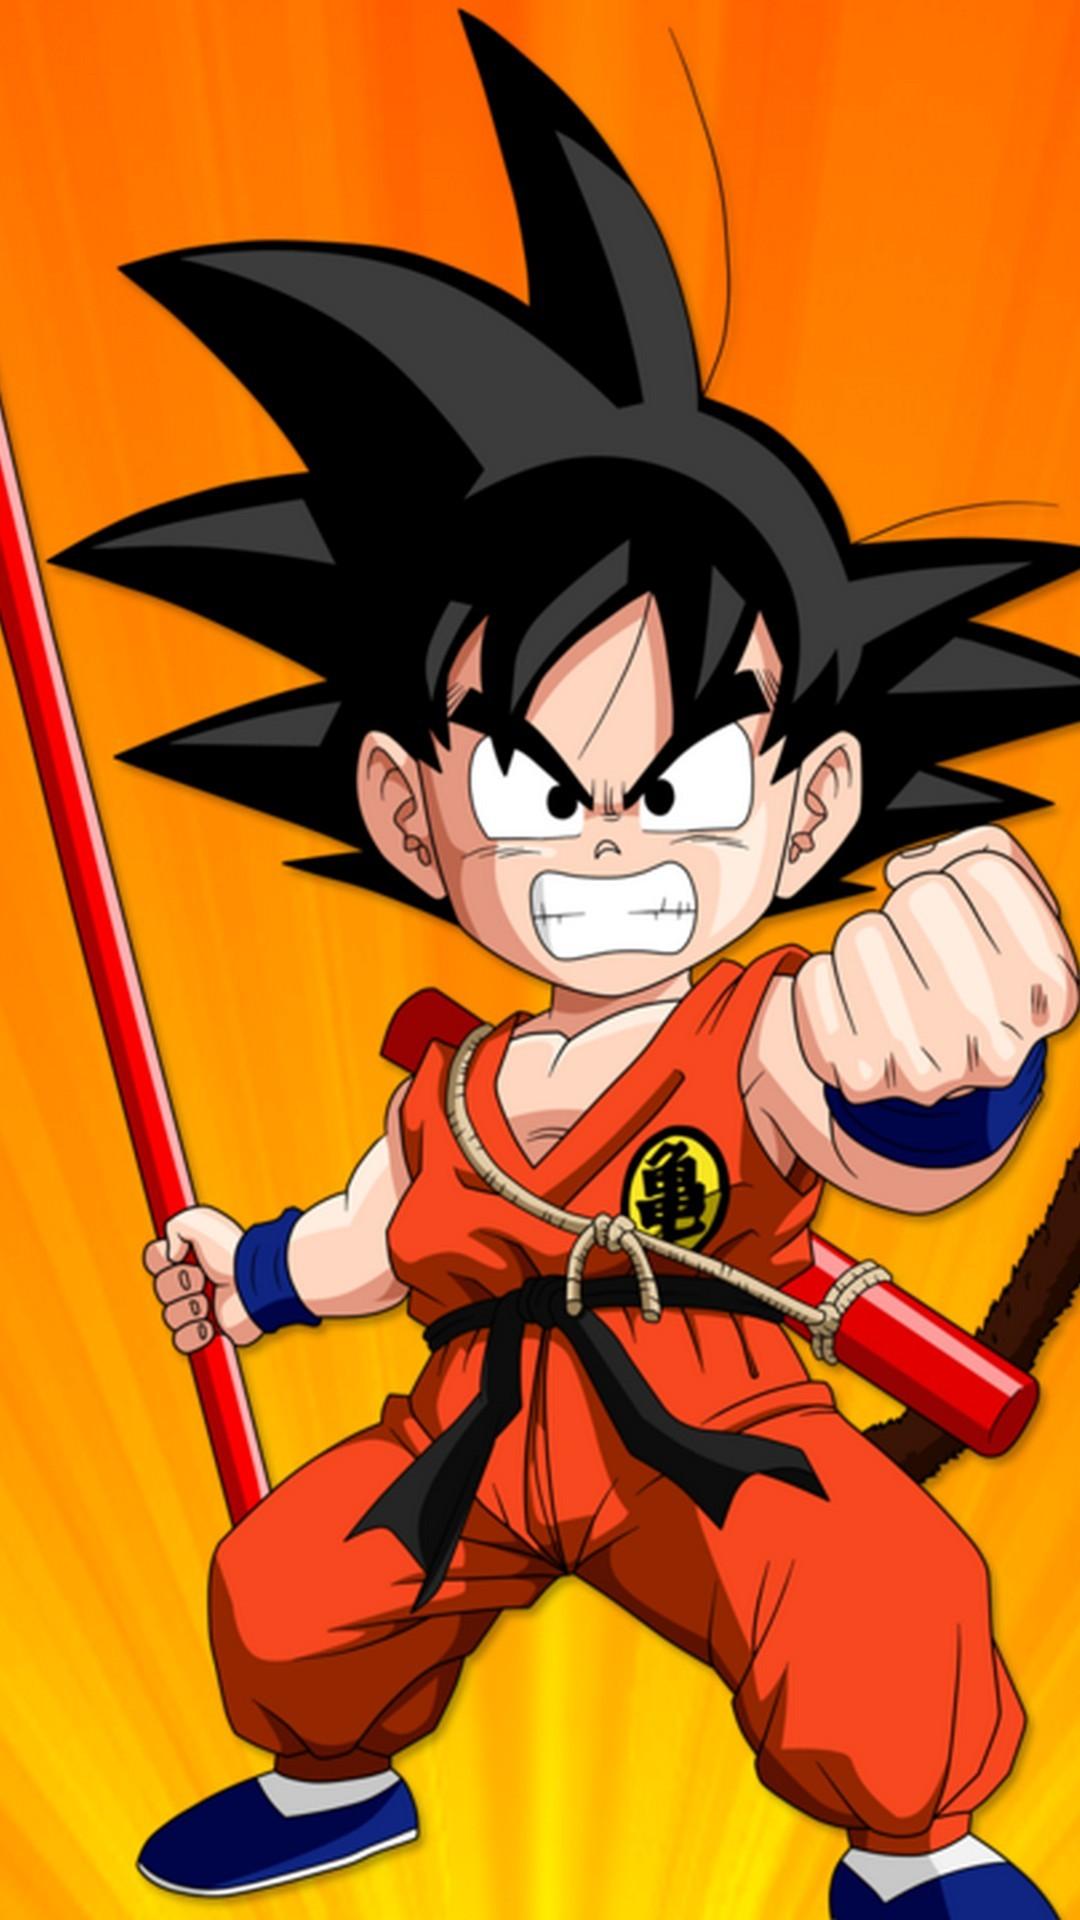 Silver Kid Goku